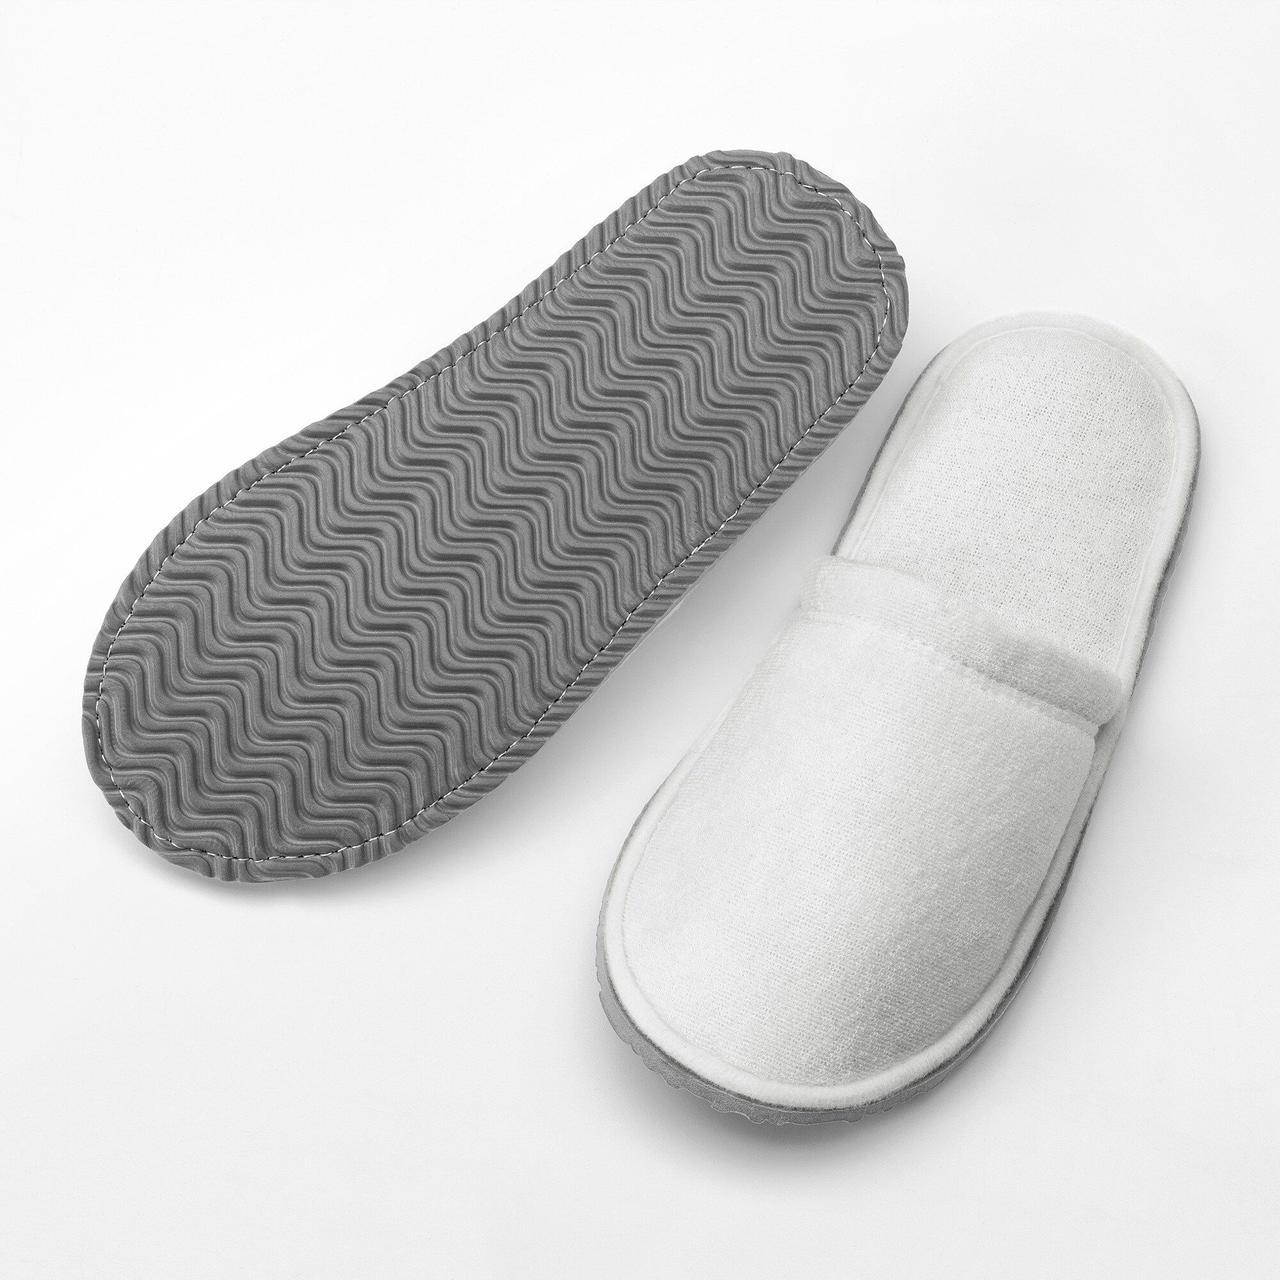 Предоплата! Тапочки домашние белые IKEA TASJON 41-43 30 см 803.920.23